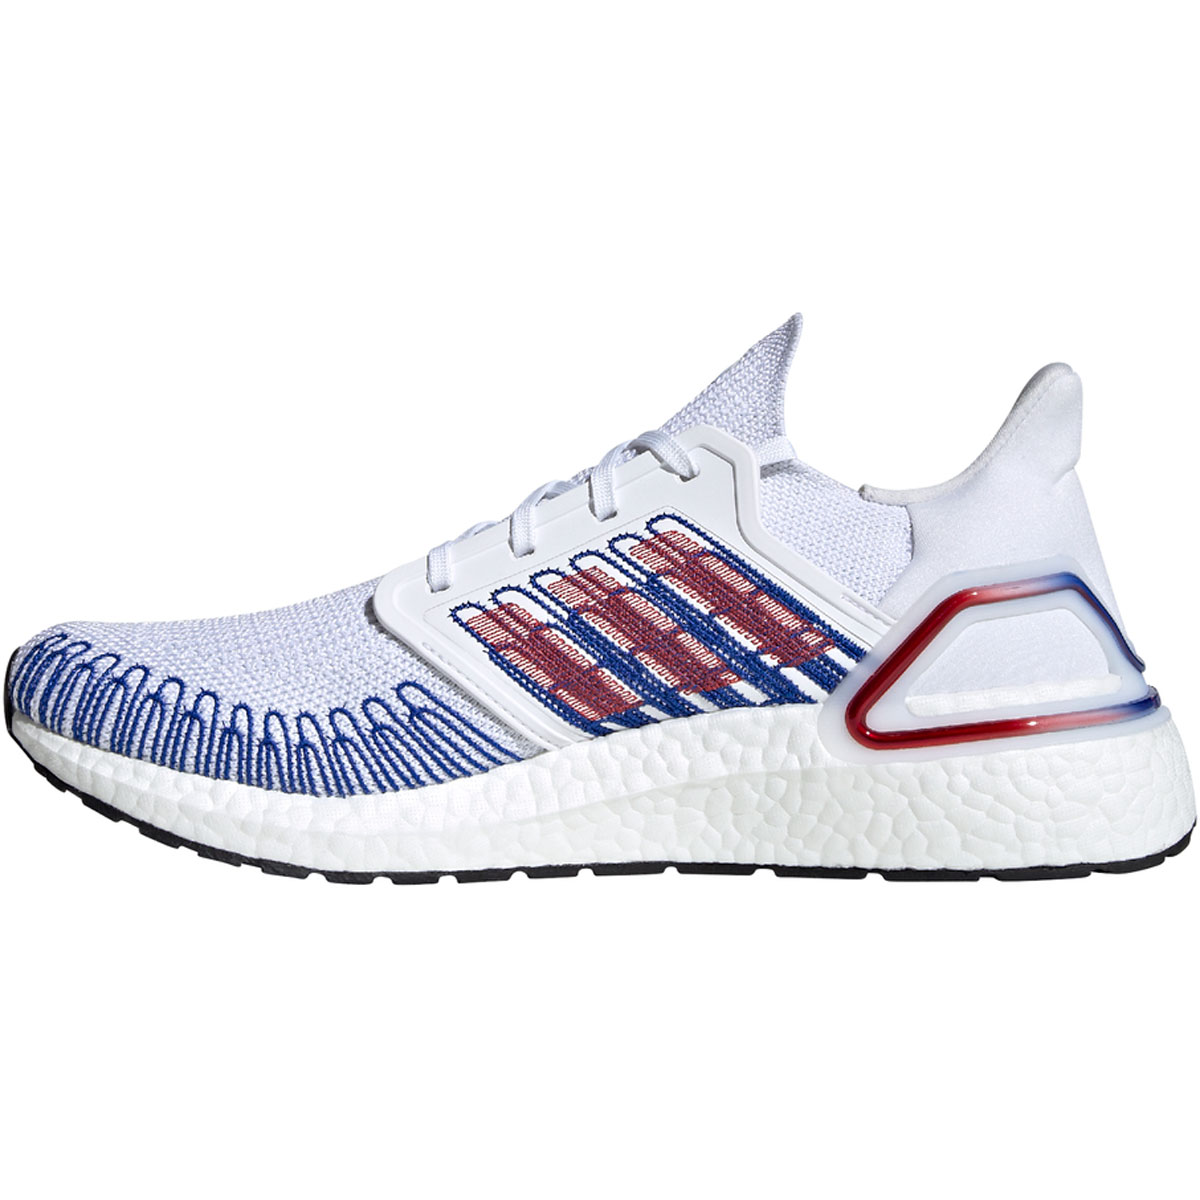 Men's Adidas Ultraboost 20 Running Shoe - Color: Cloud White/Scarlet/Royal Blue - Size: 6.5 - Width: Regular, Cloud White/Scarlet/Royal Blue, large, image 2